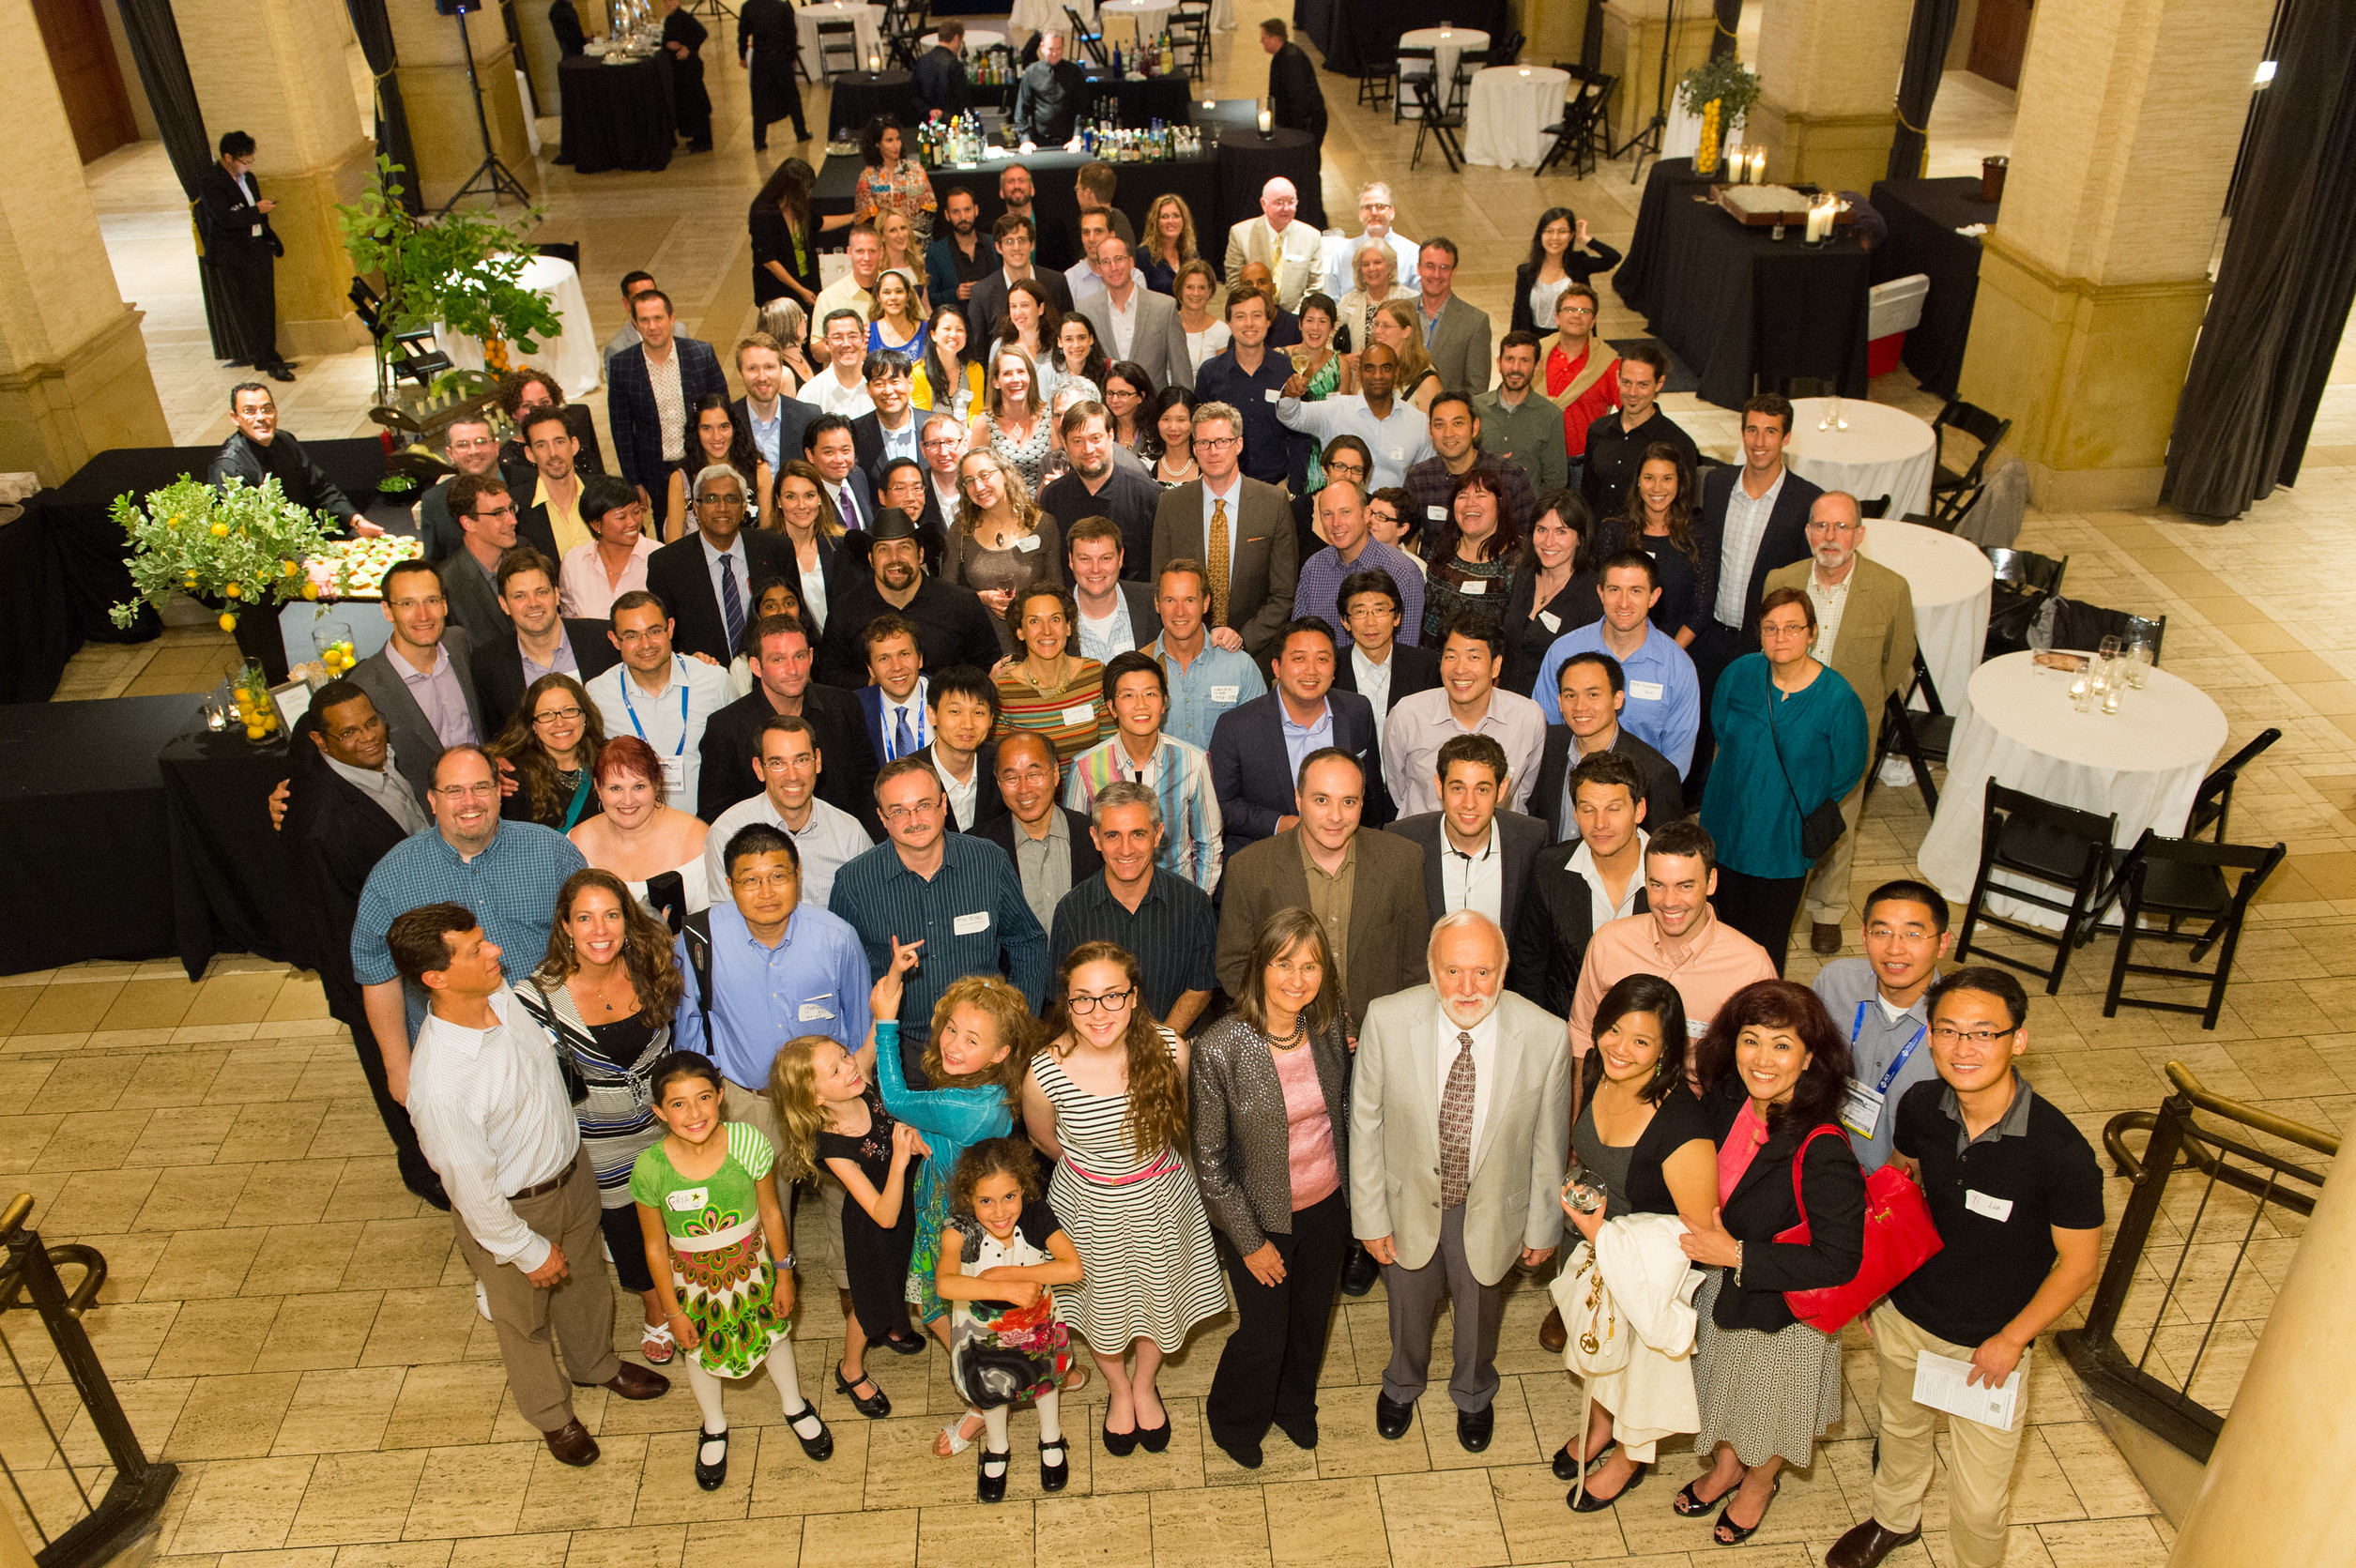 2014 ACS conference San Francisco Fréchet Alumni